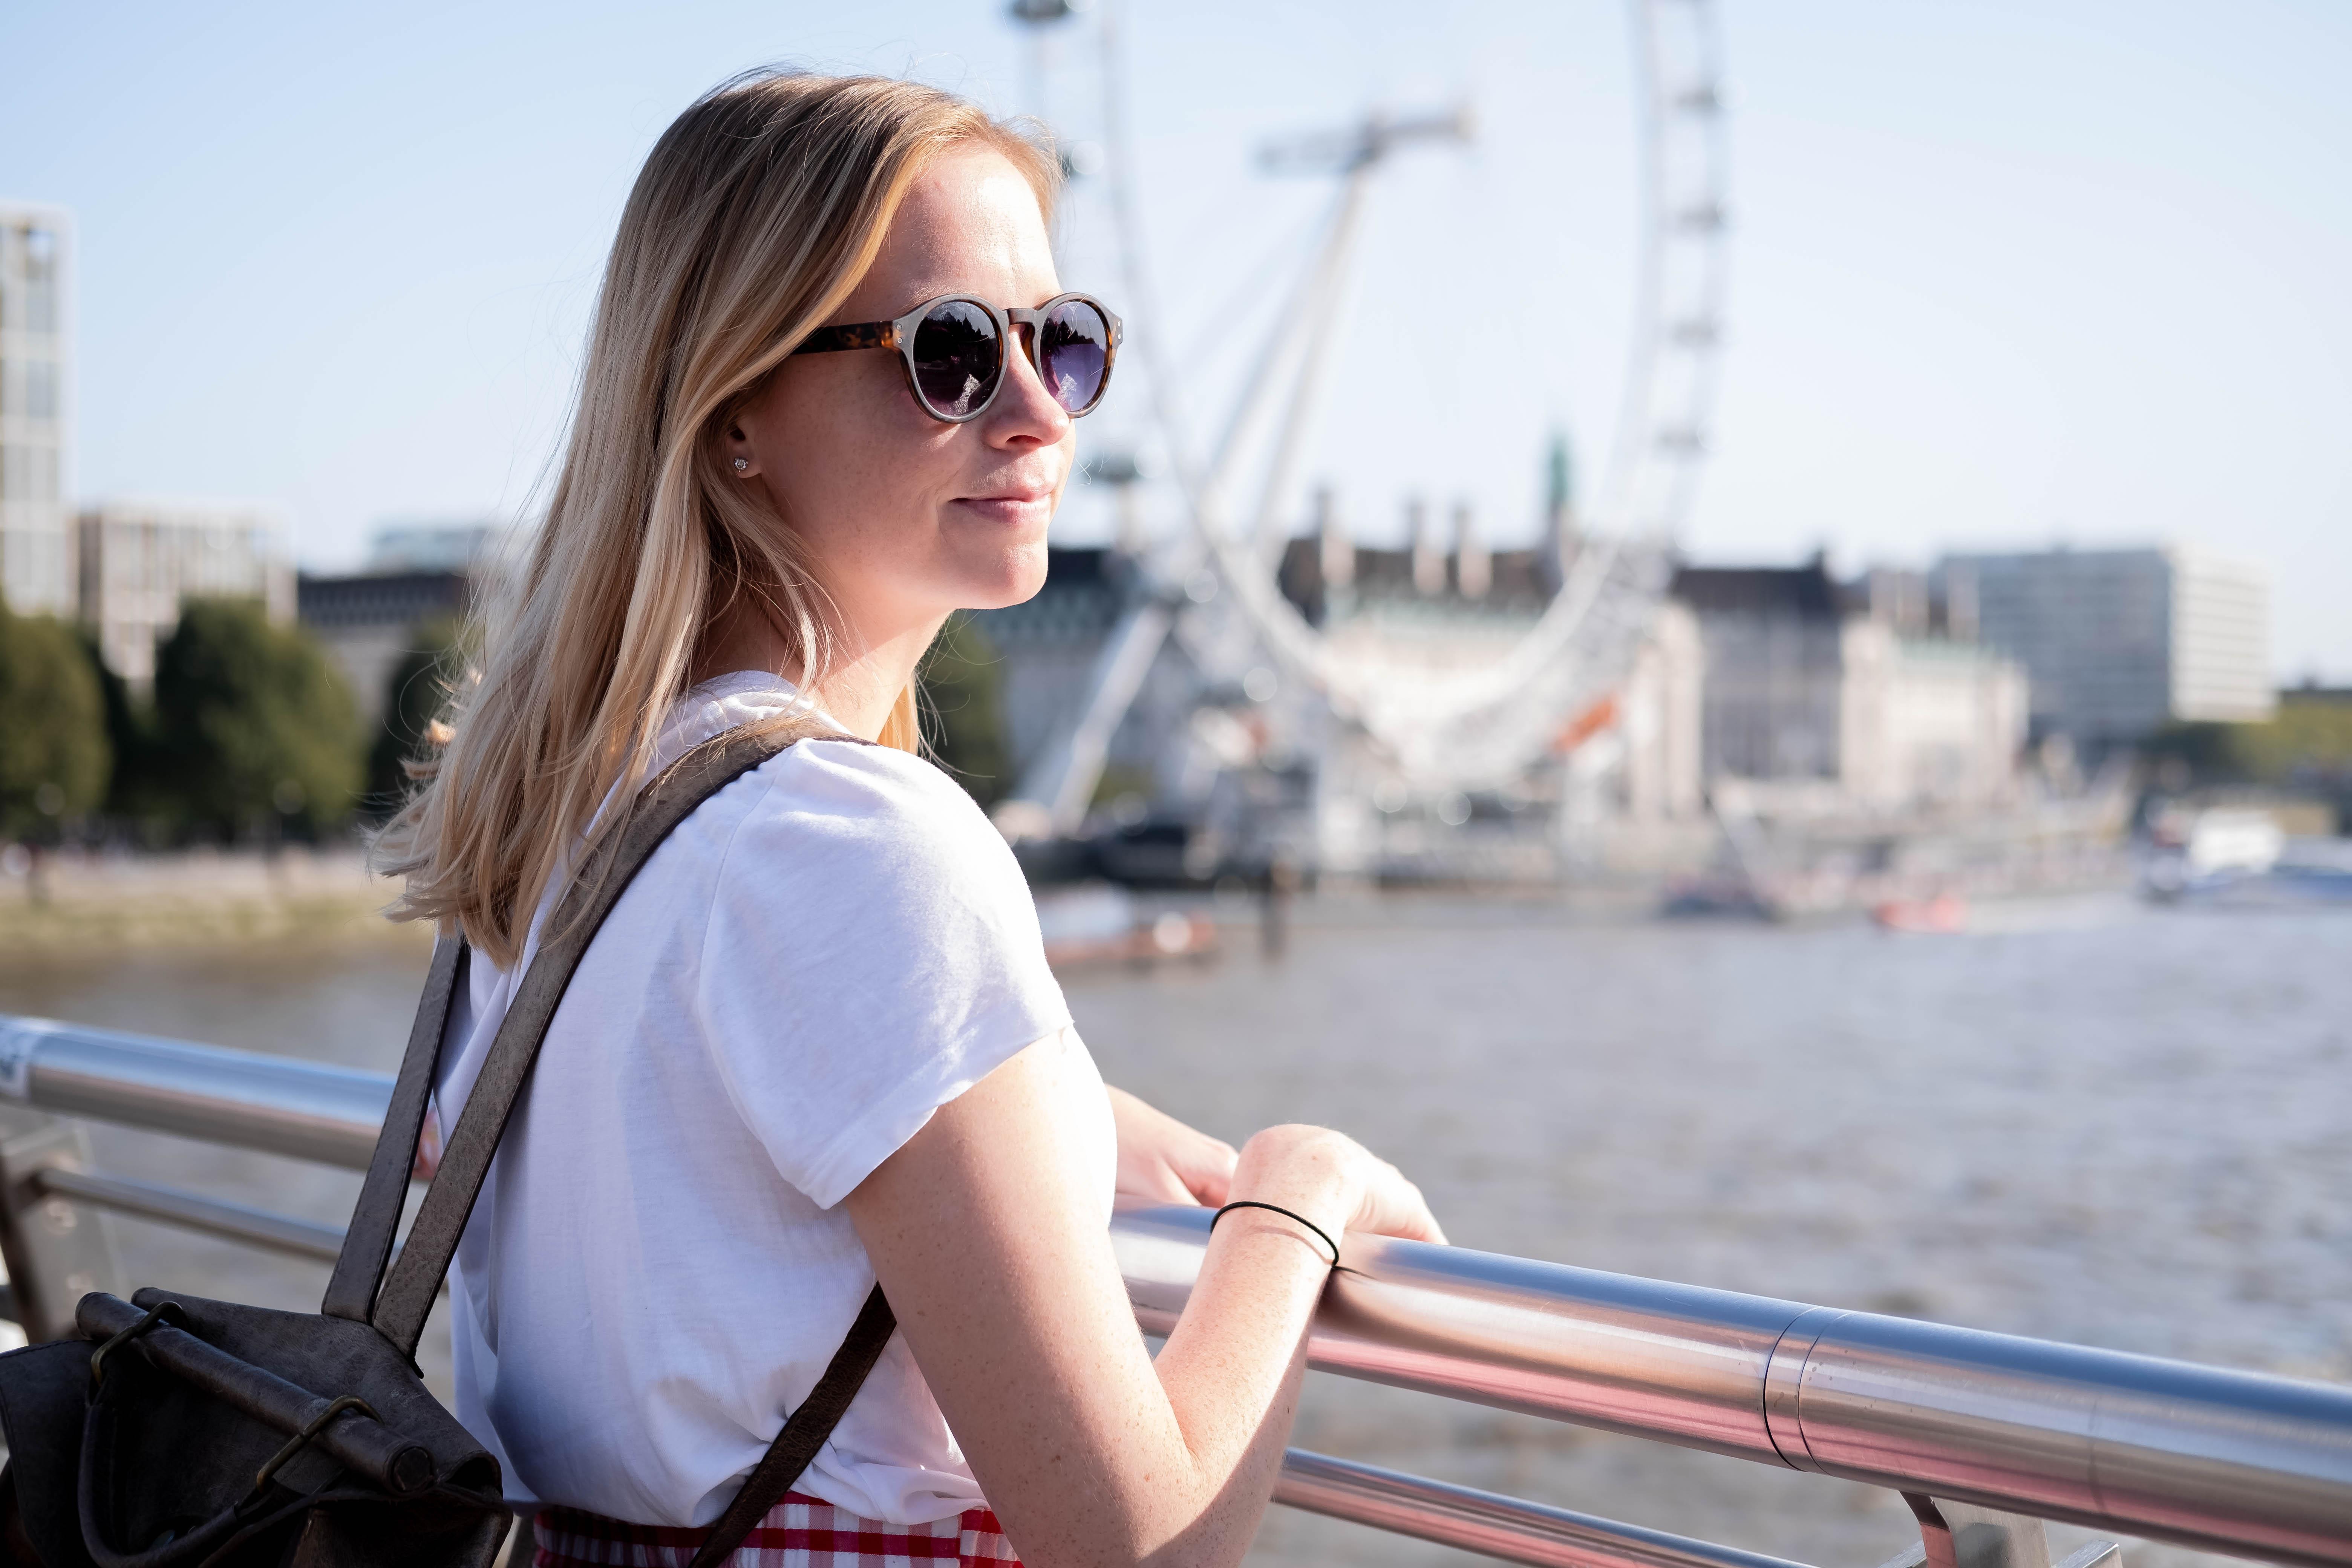 Celeste in front of the London Eye